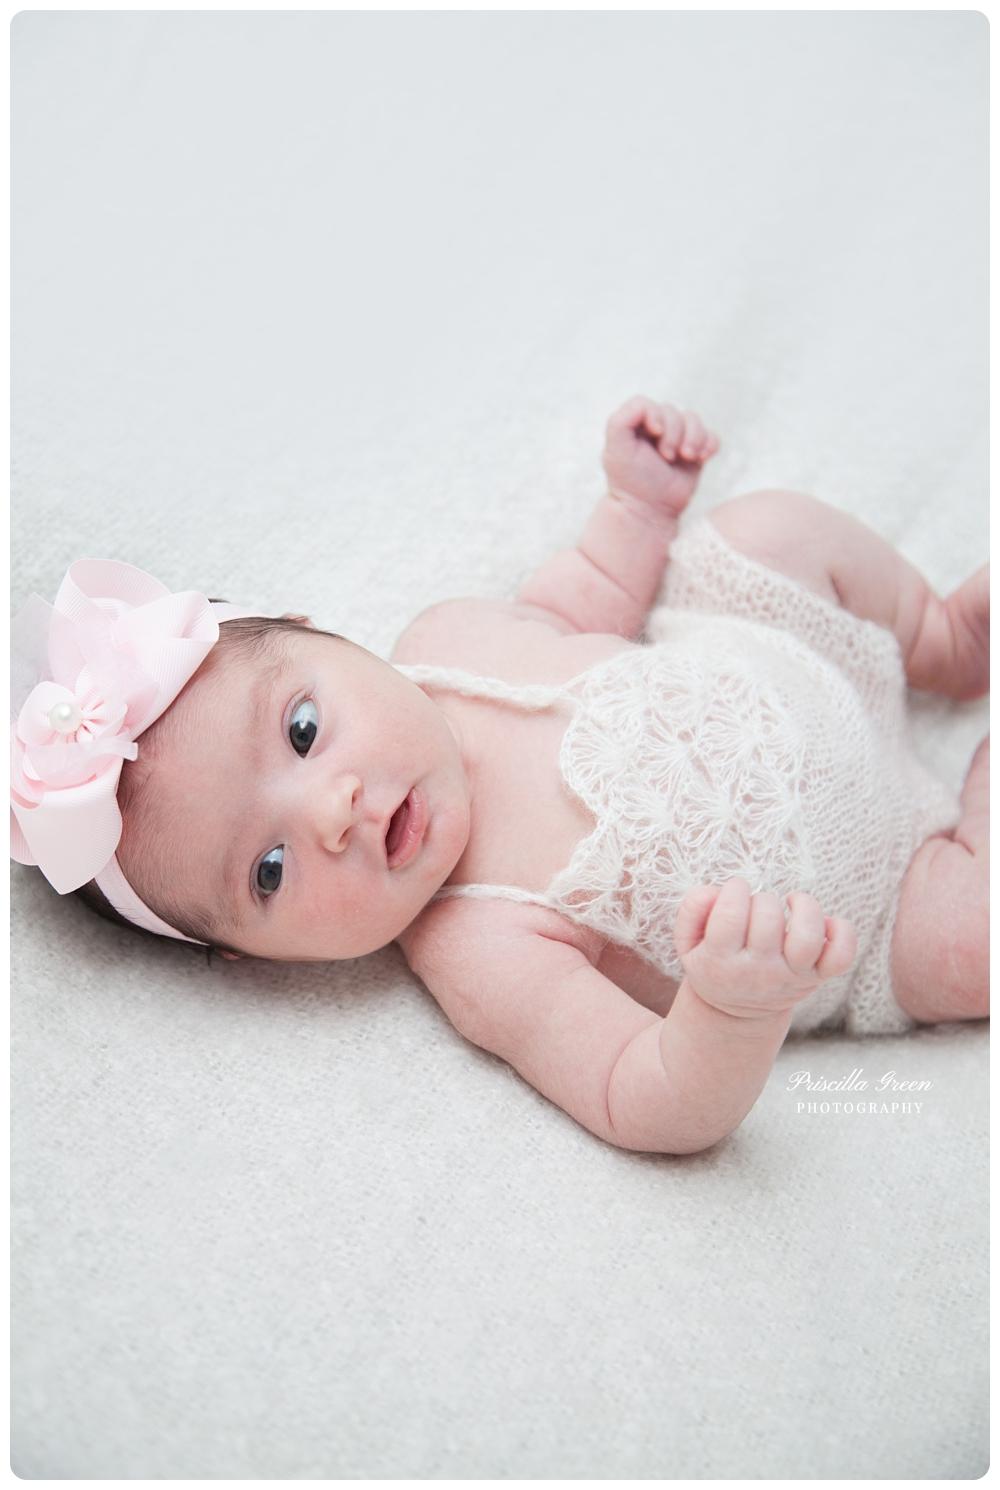 charlottephotographer_newborn_Priscillagreenphotography_0012.jpg